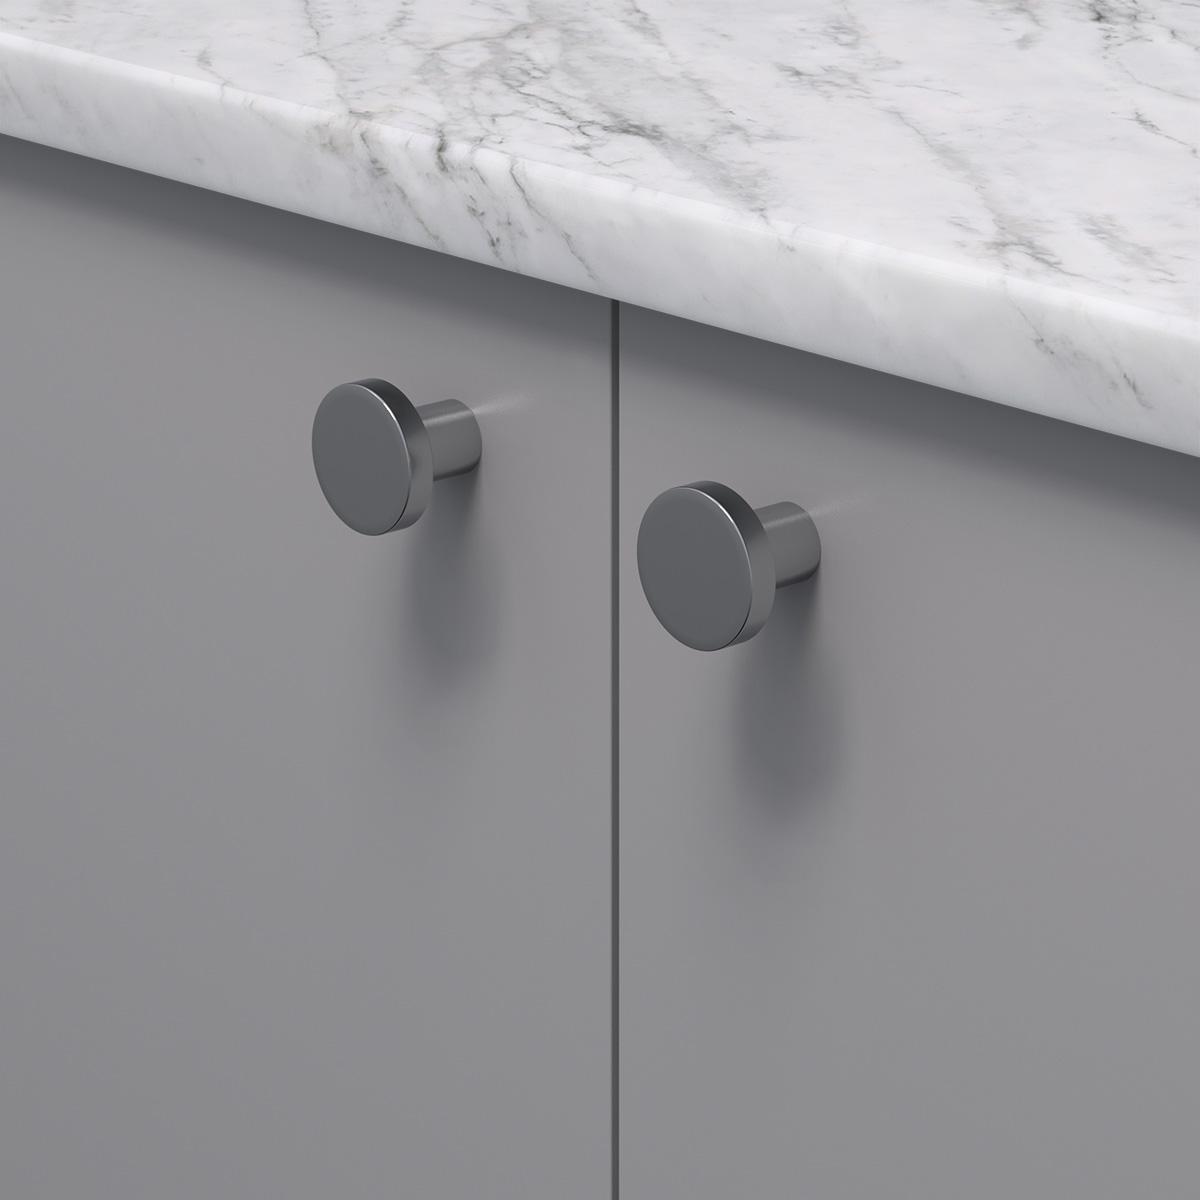 Knopp 2078 krom 368011 11 28 mm ncs s 4500 n marmor carrara